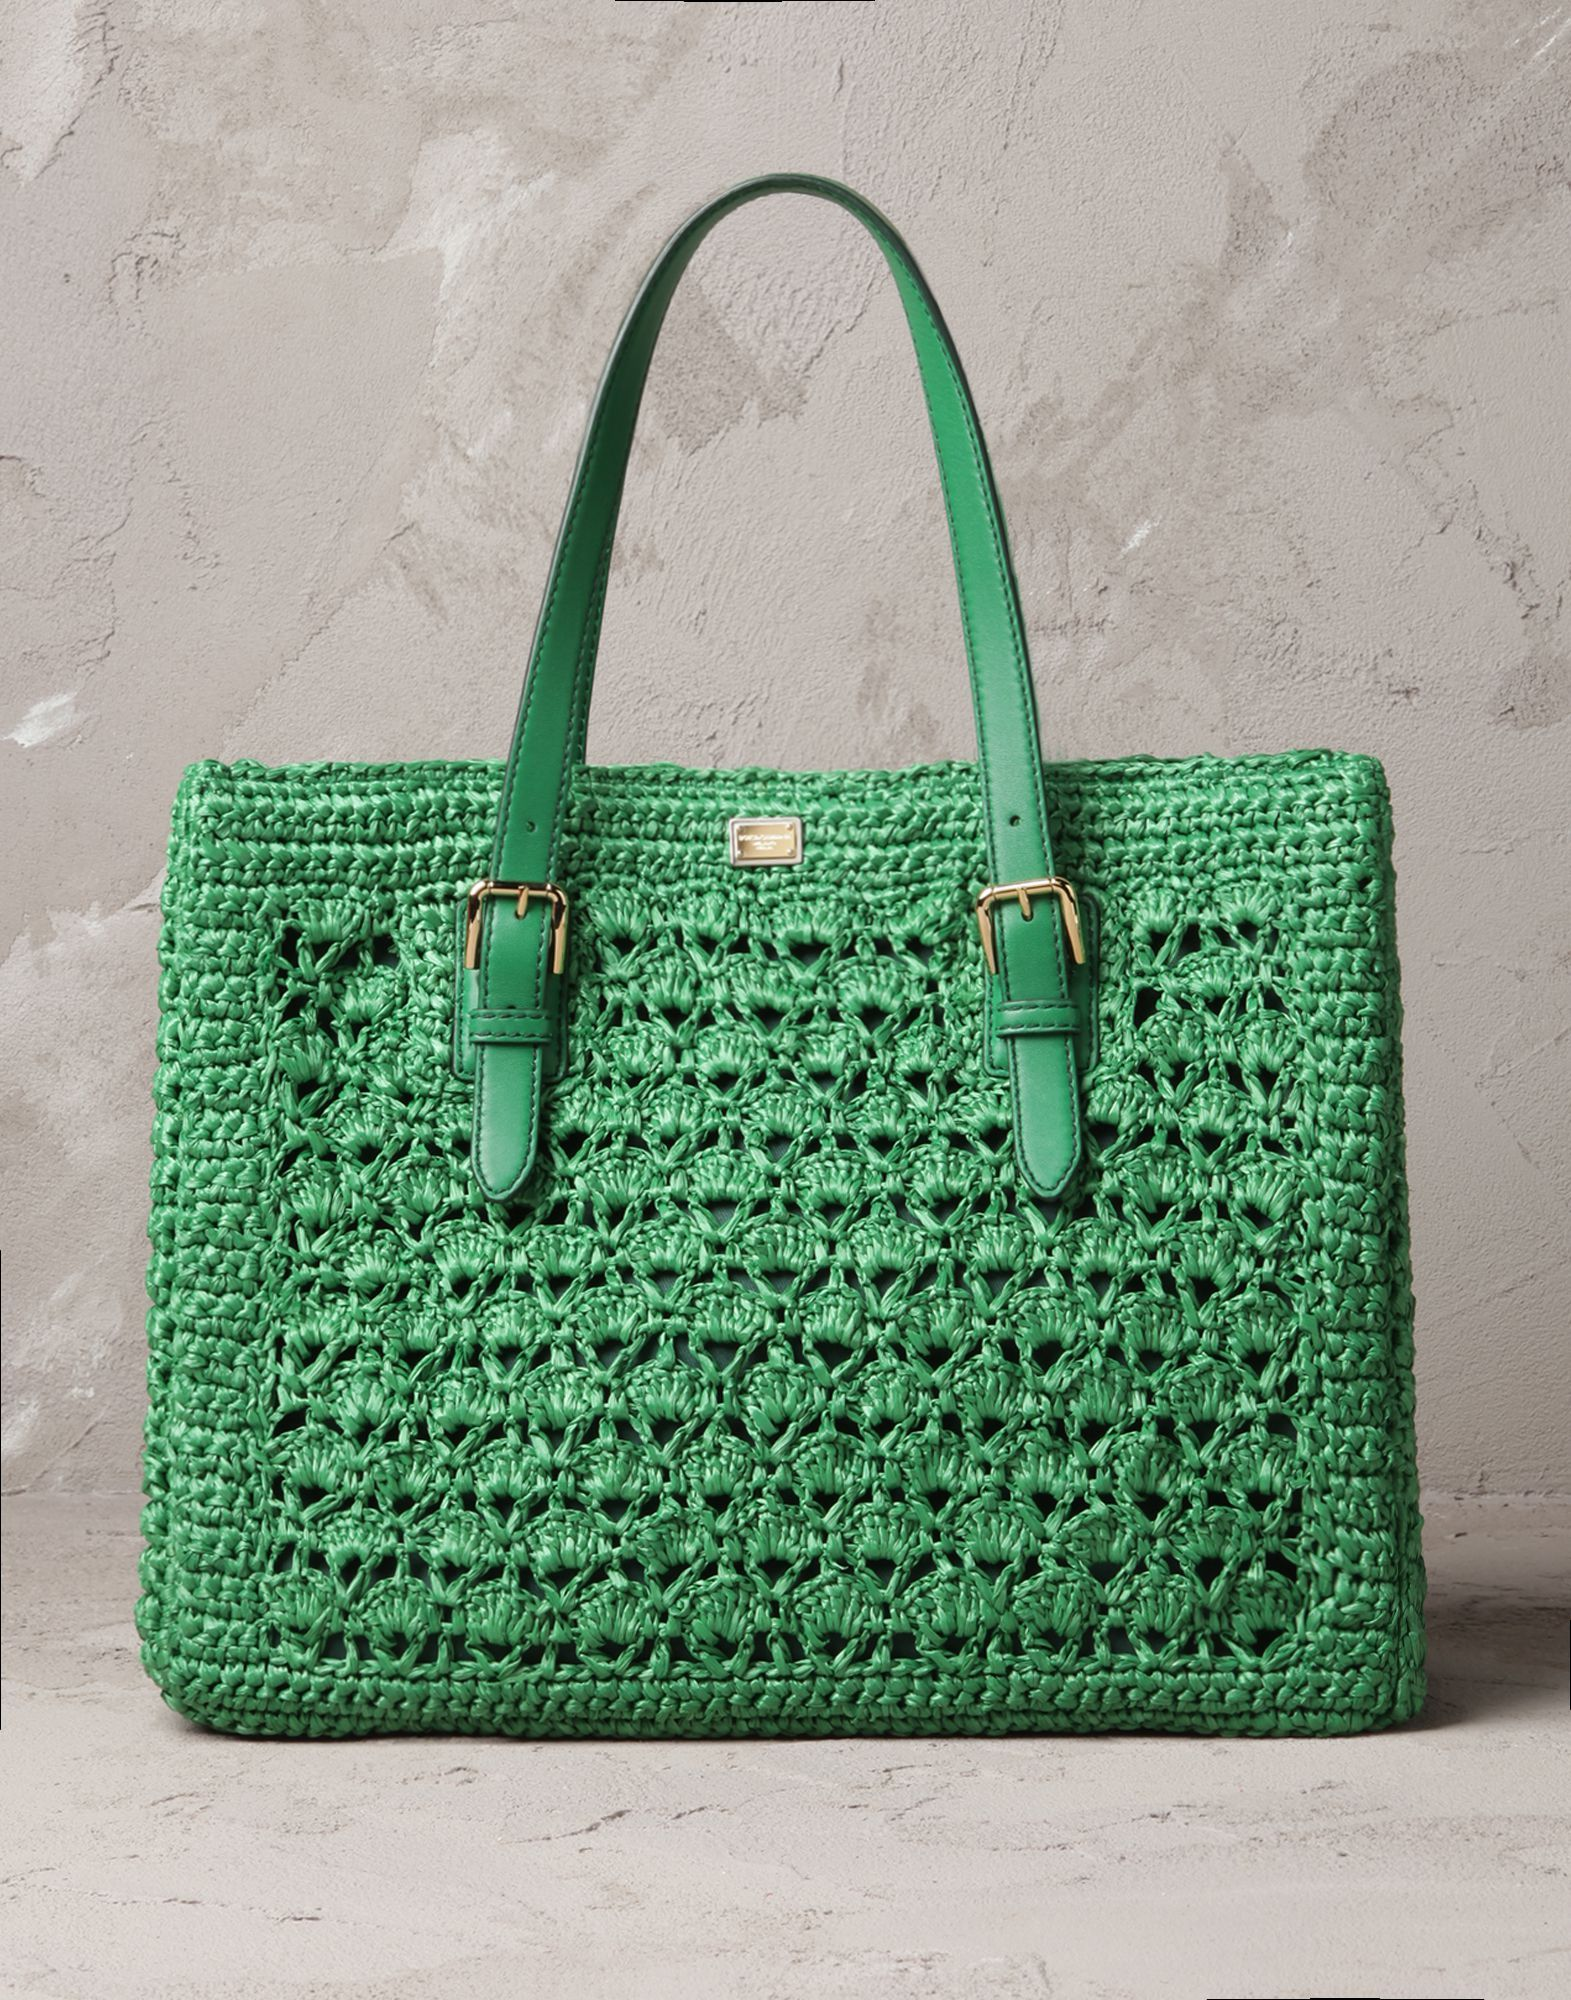 Dolce Gabbana   BB5728-AT128   Large fabric bags   Bags   Bolsa ... 5df9fcf8f8